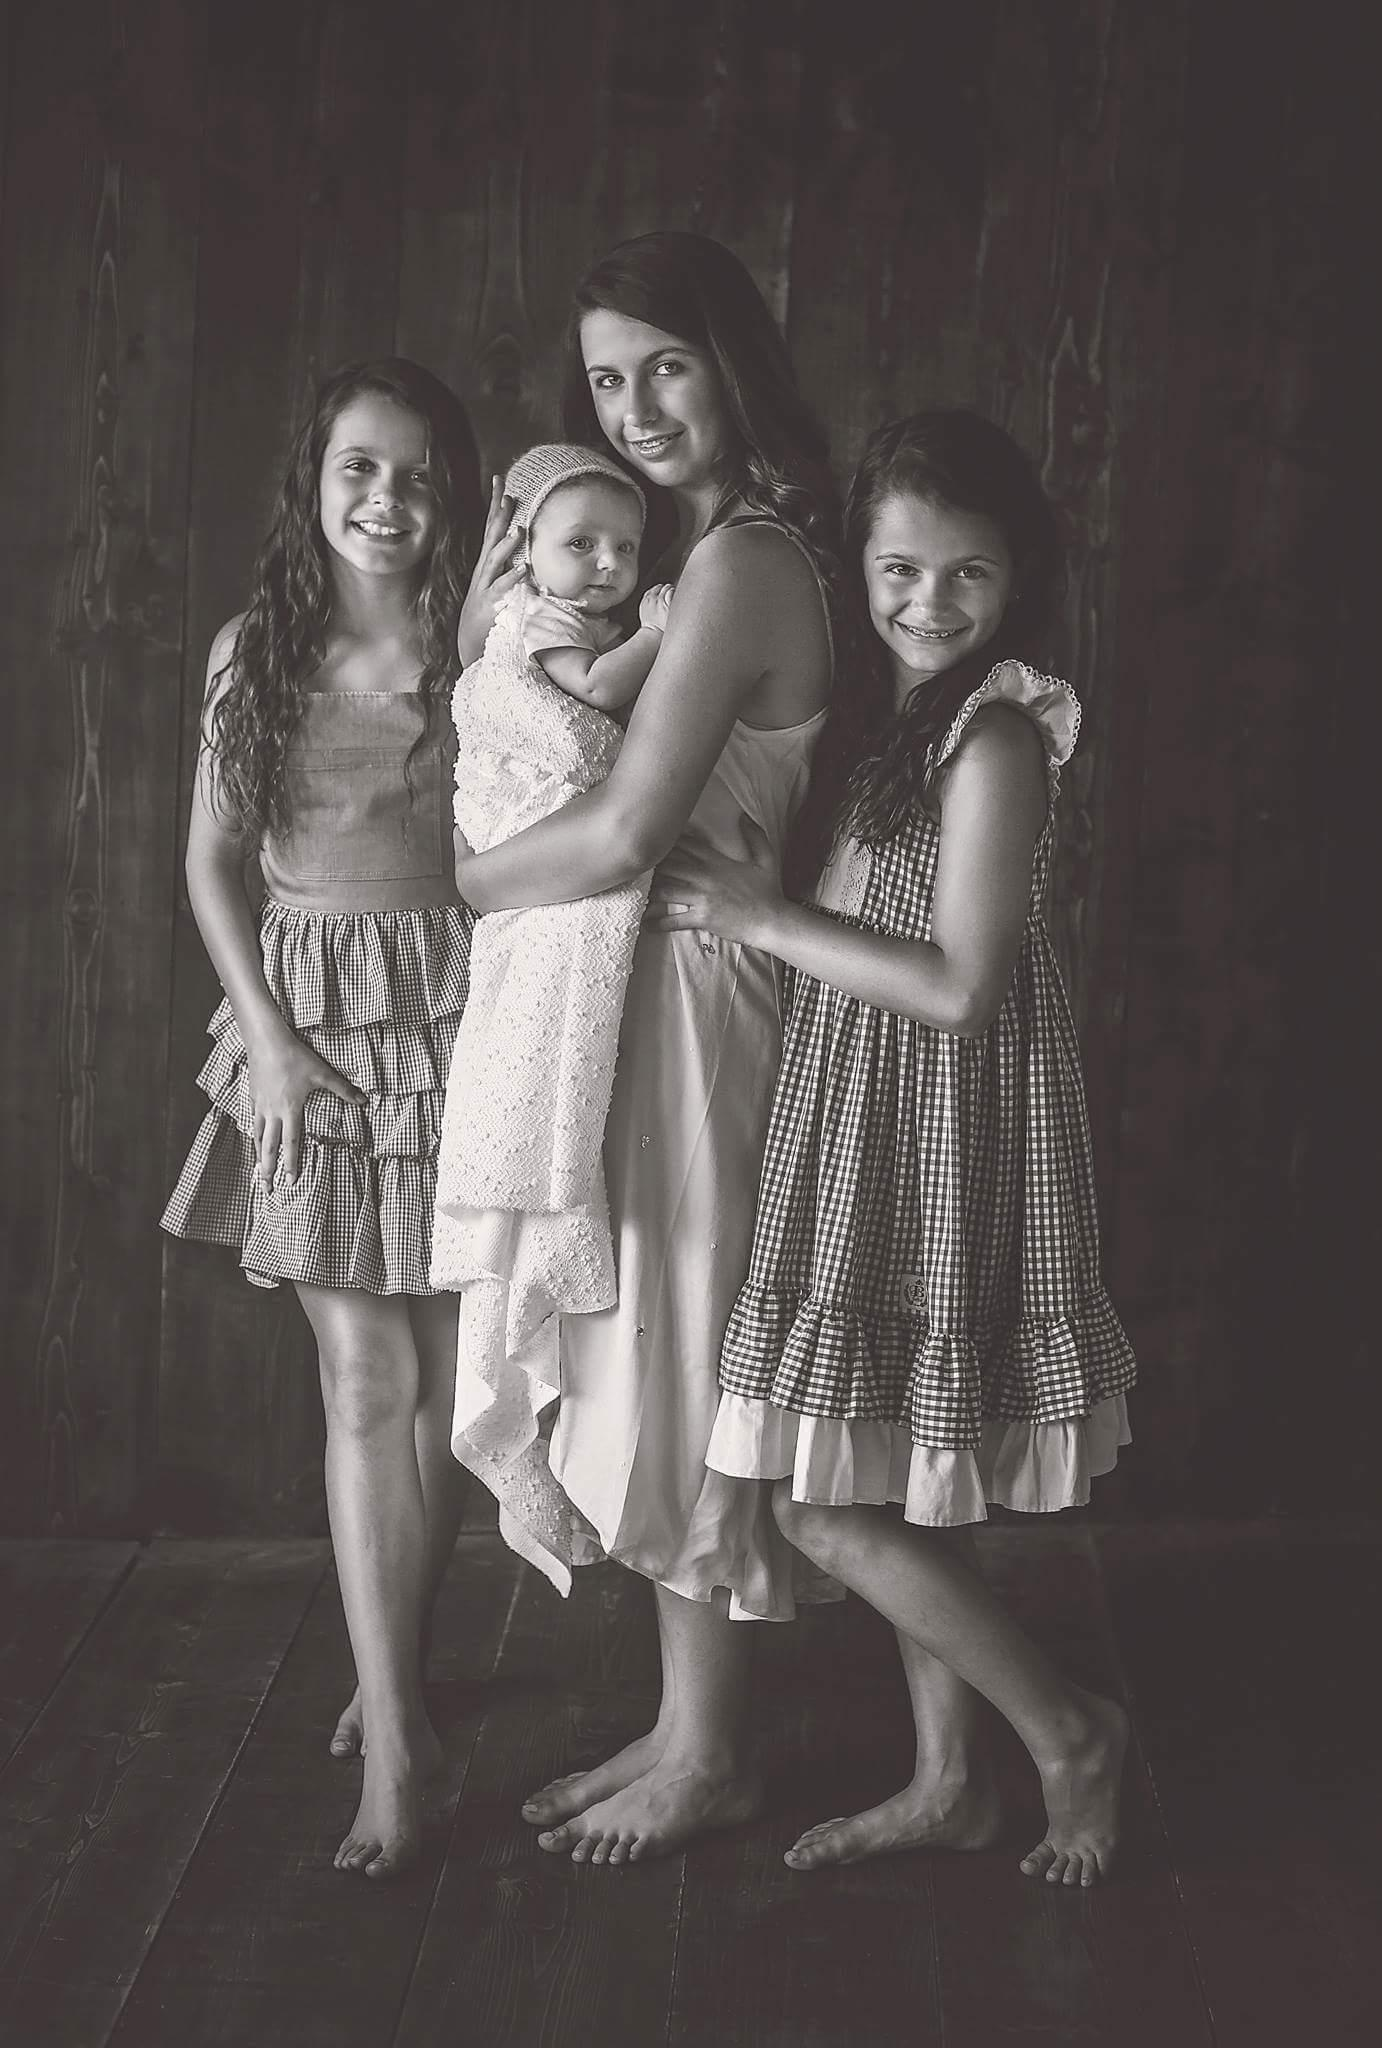 My daughters - Ava, Sophia, Natalie, and Arya